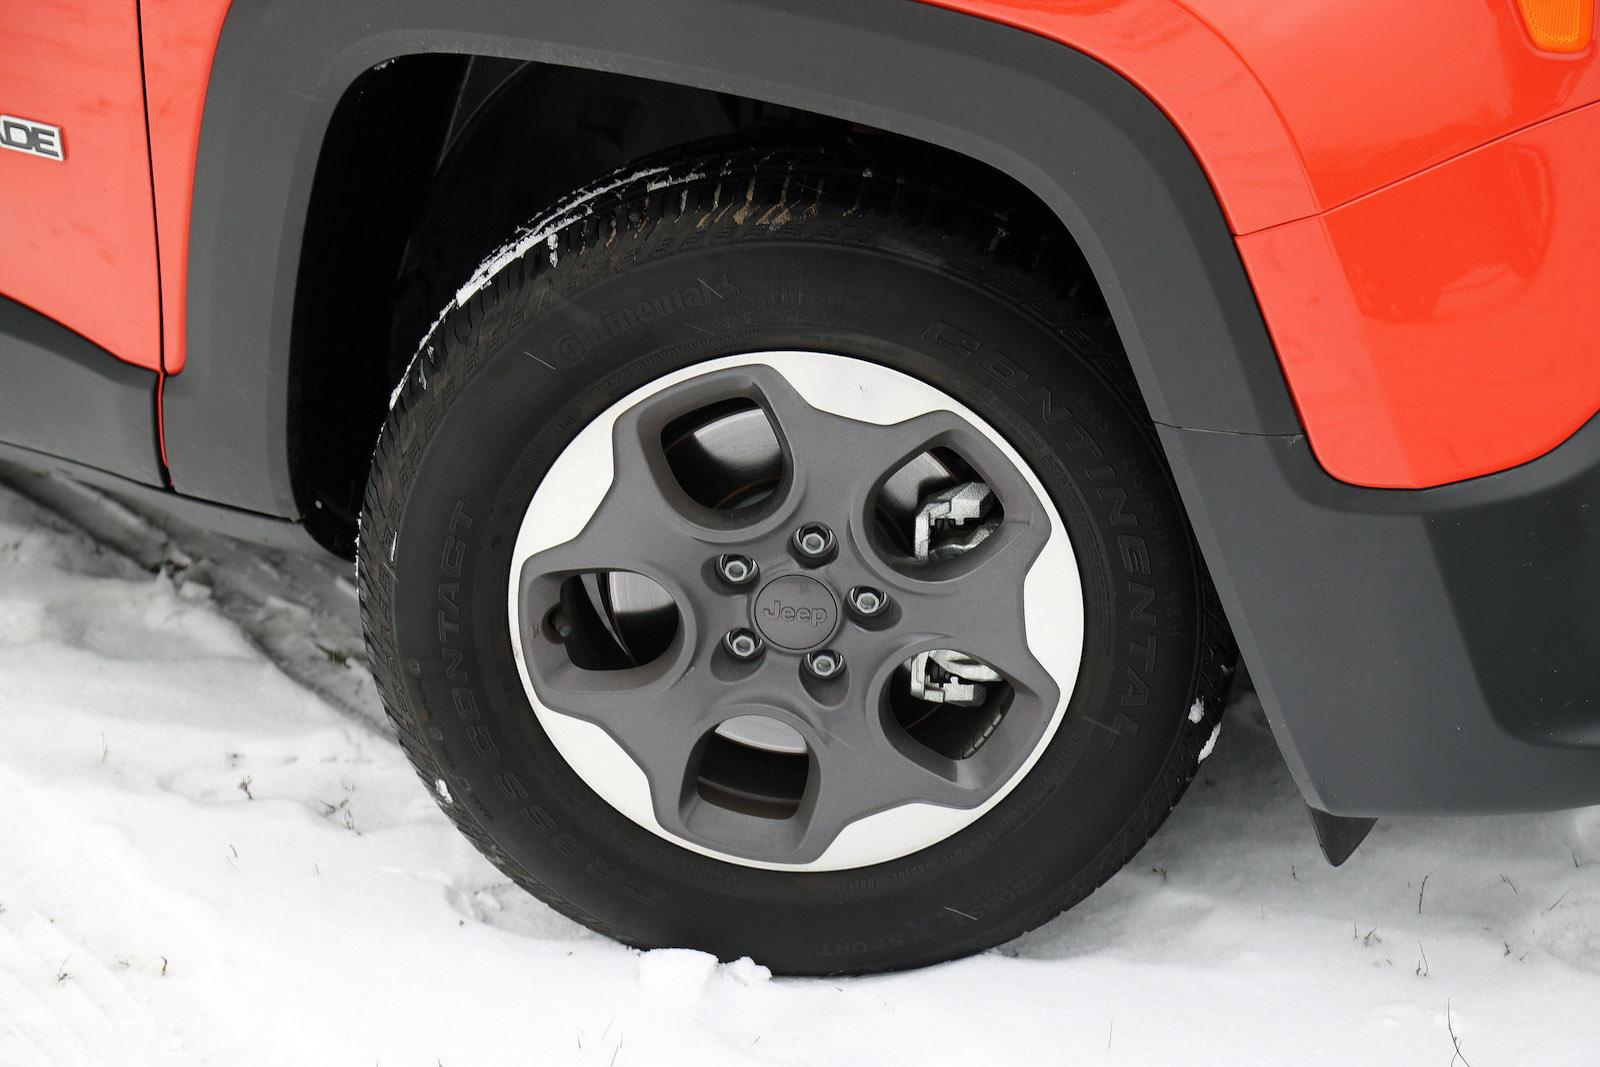 Jeep Renegade Vs Honda Crv >> Best Winter Tires For The 2015 Honda Crv | Autos Post